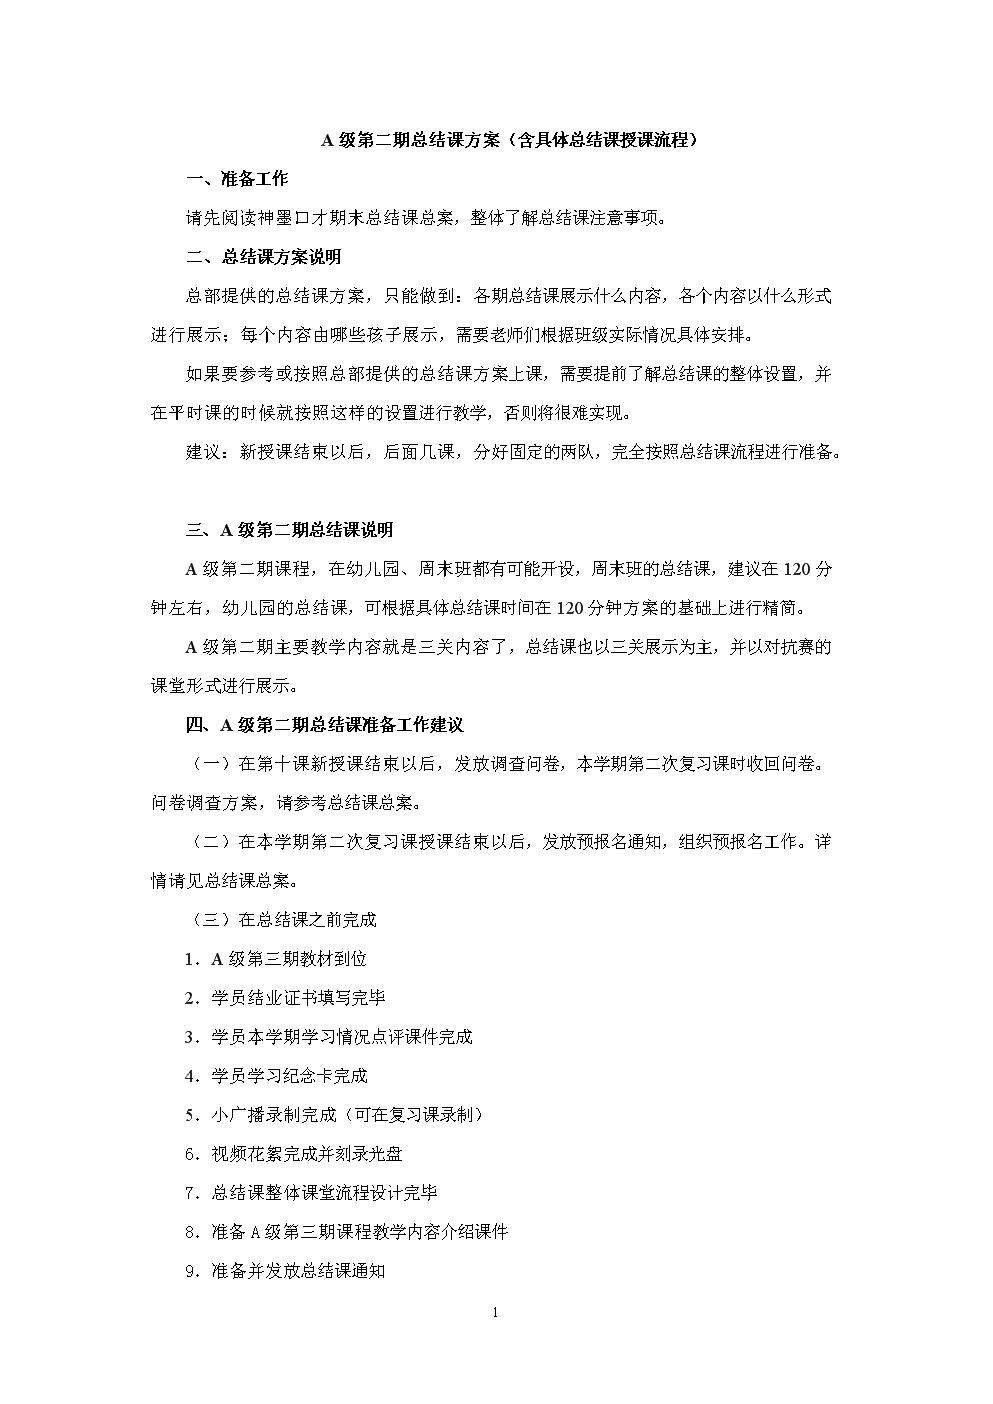 A级第二期总结课方案 V3.0.doc